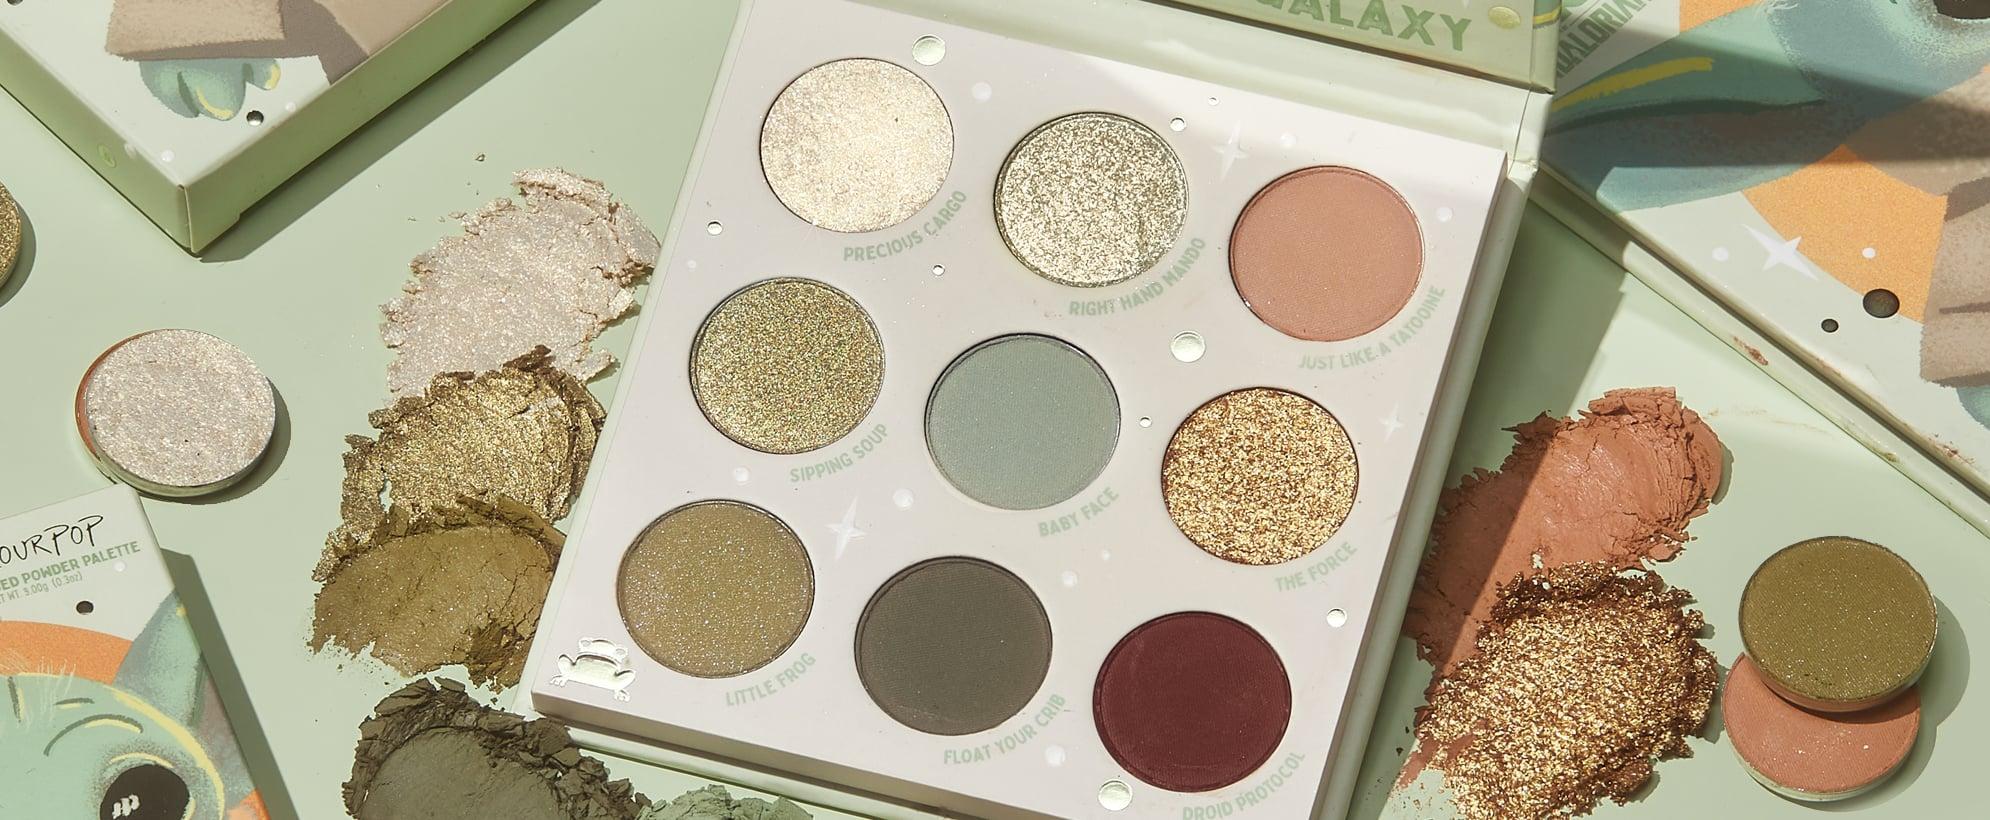 ColourPop Is Releasing a Baby Yoda Eyeshadow Palette